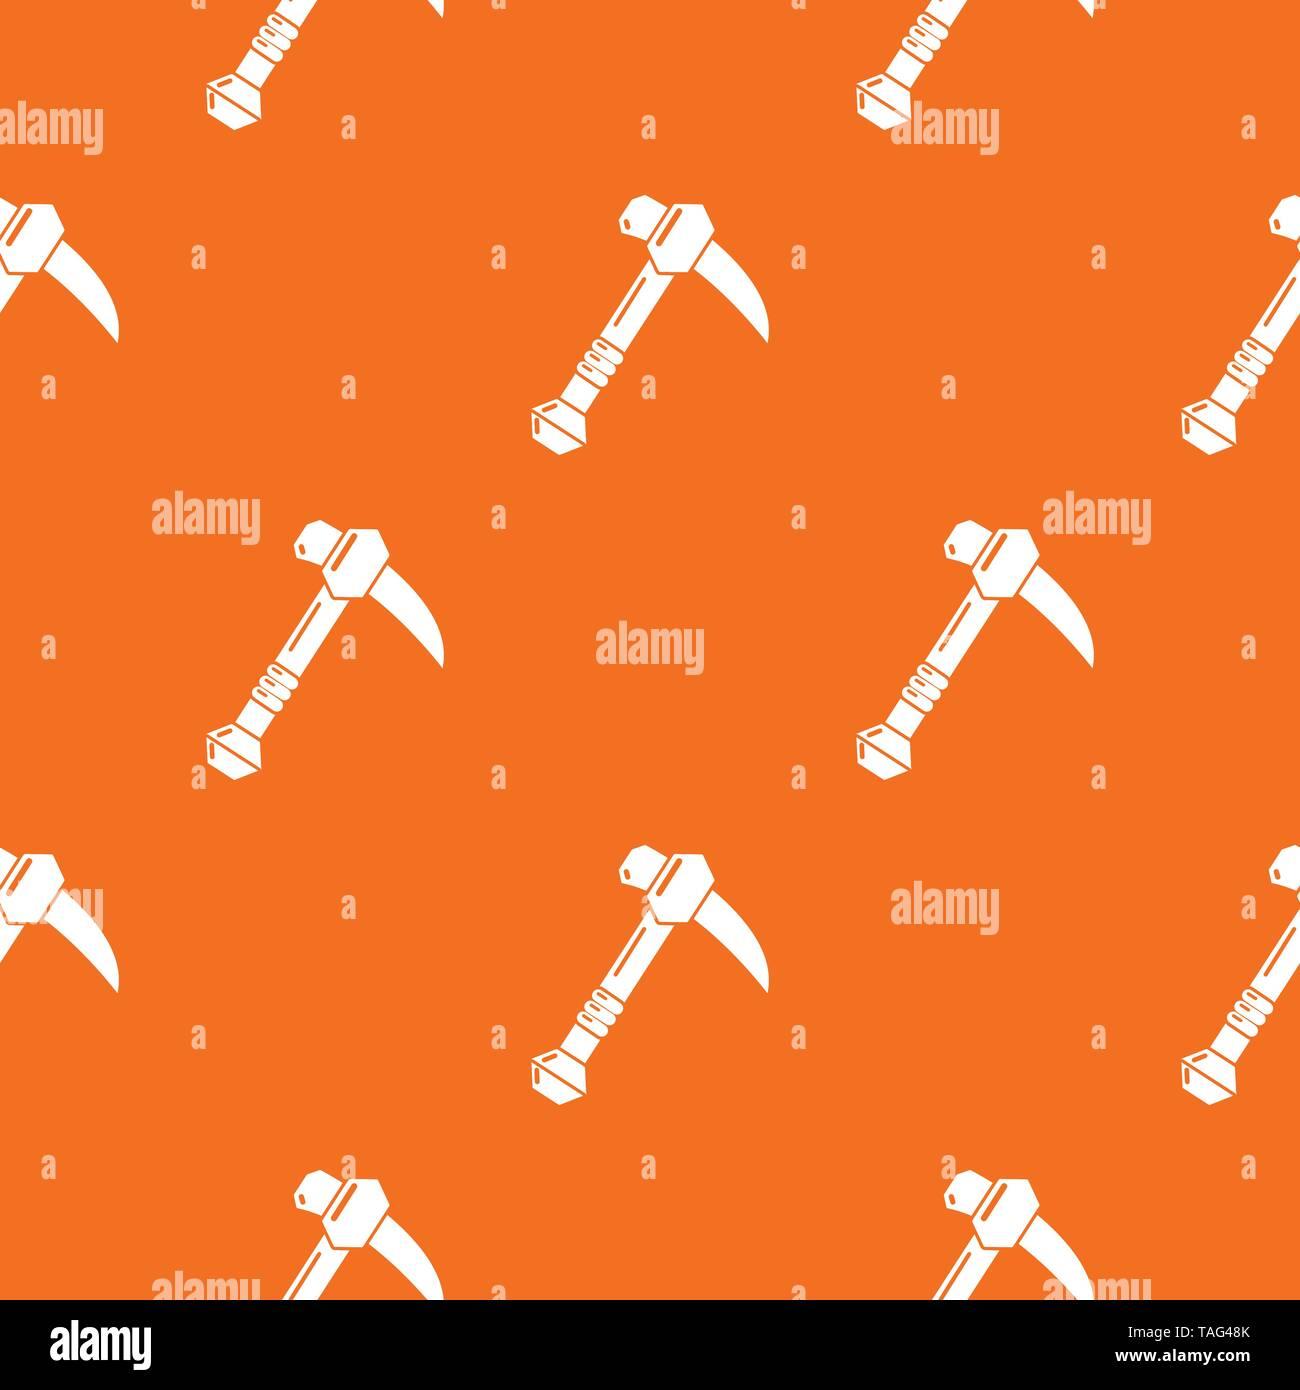 Ax pattern vector orange - Stock Image